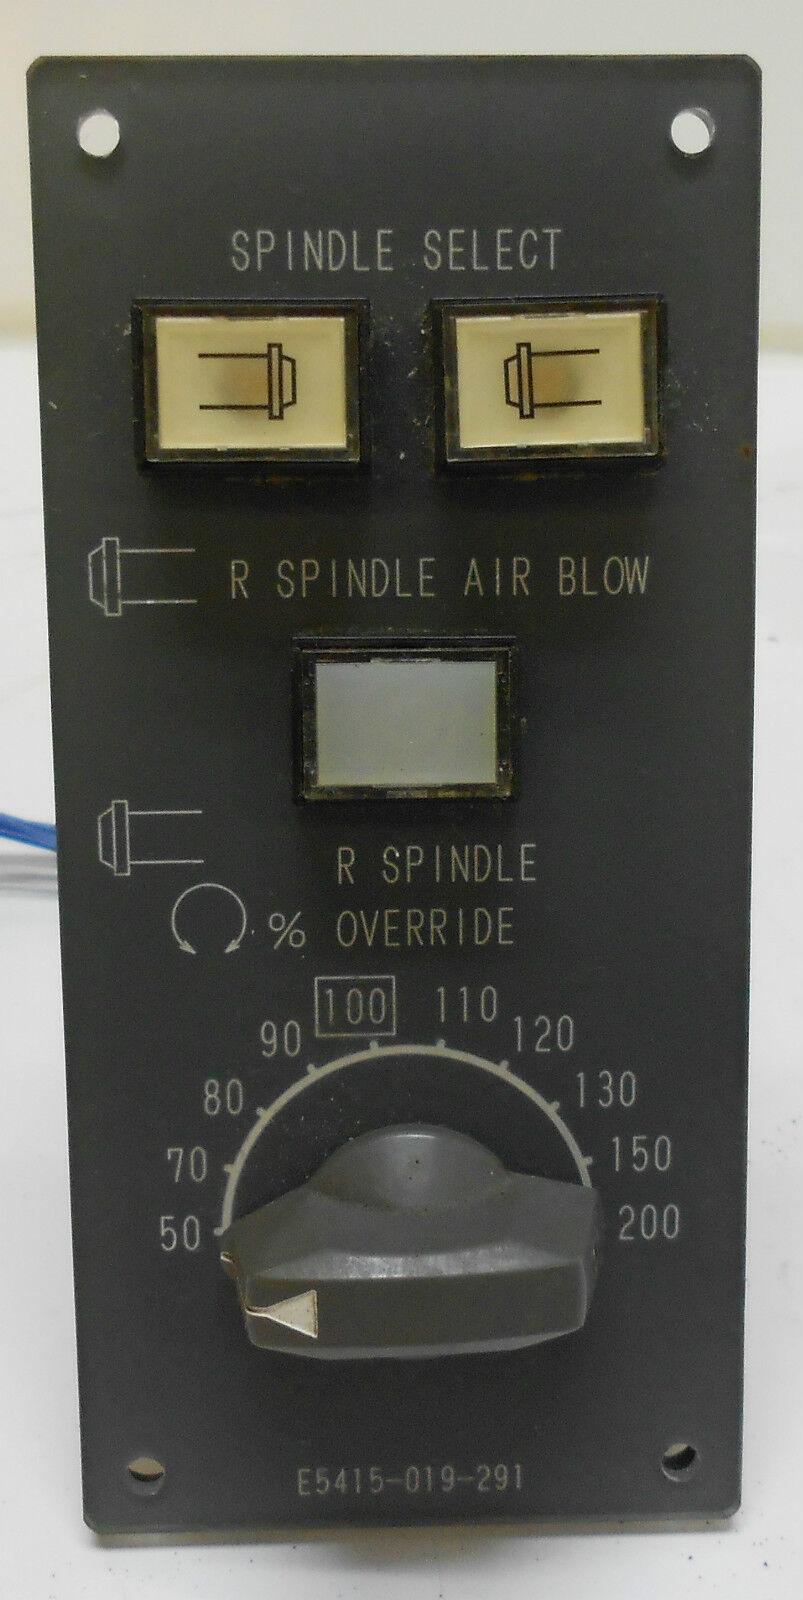 Okuma Operator Panel, E5415-019-291, Off LT25 Turning Center, Used, WARRANTY